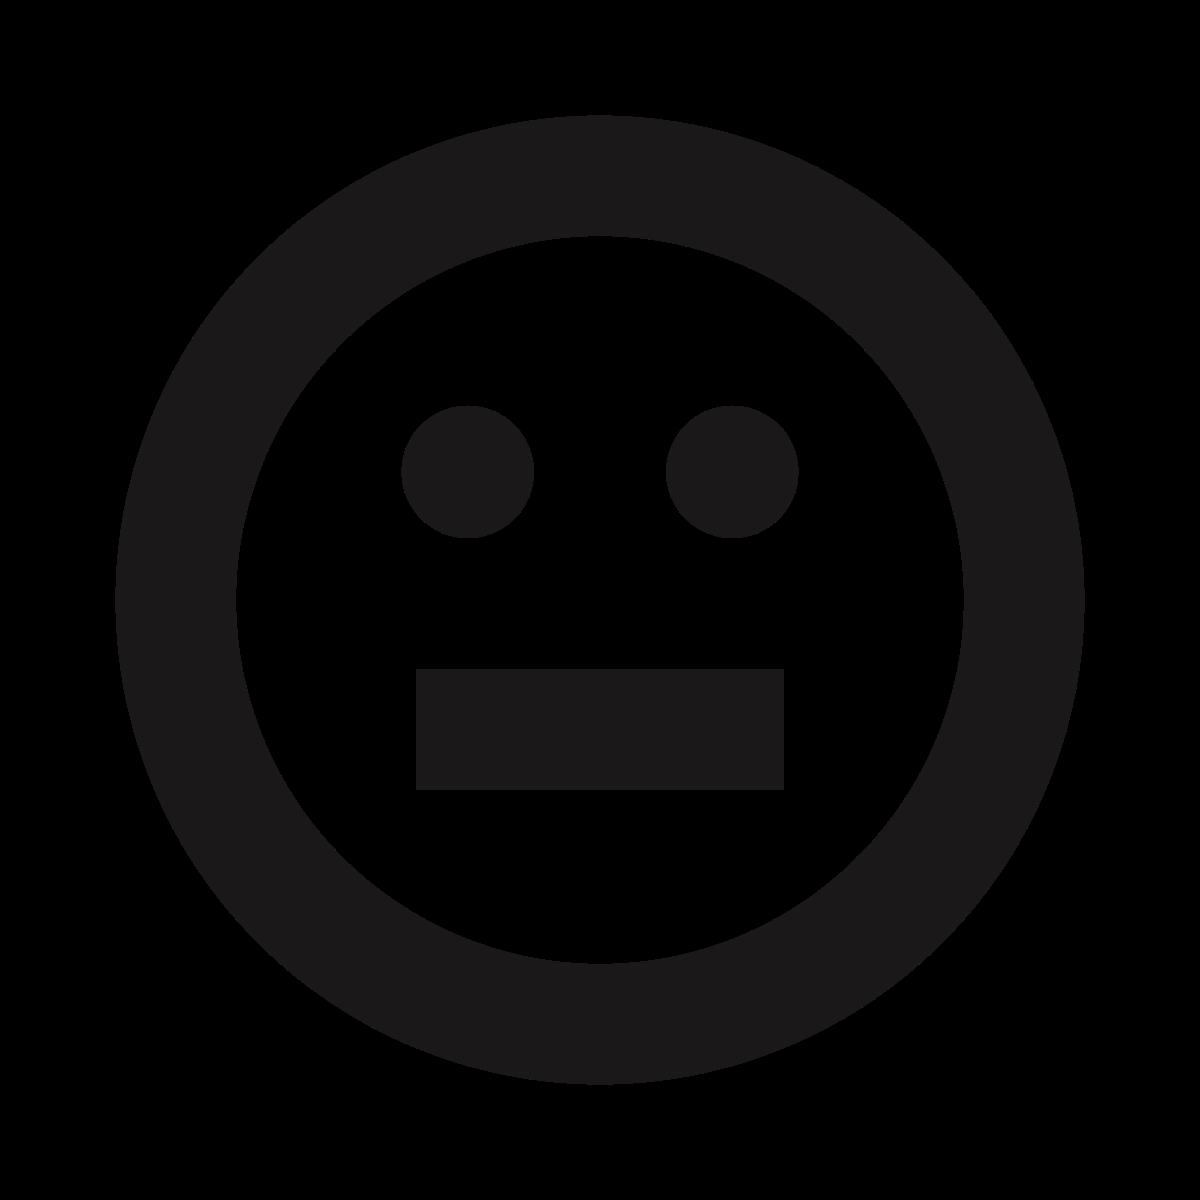 stare  uneasy  straight face  blank  thick lines  emoticon  emojis icon icon